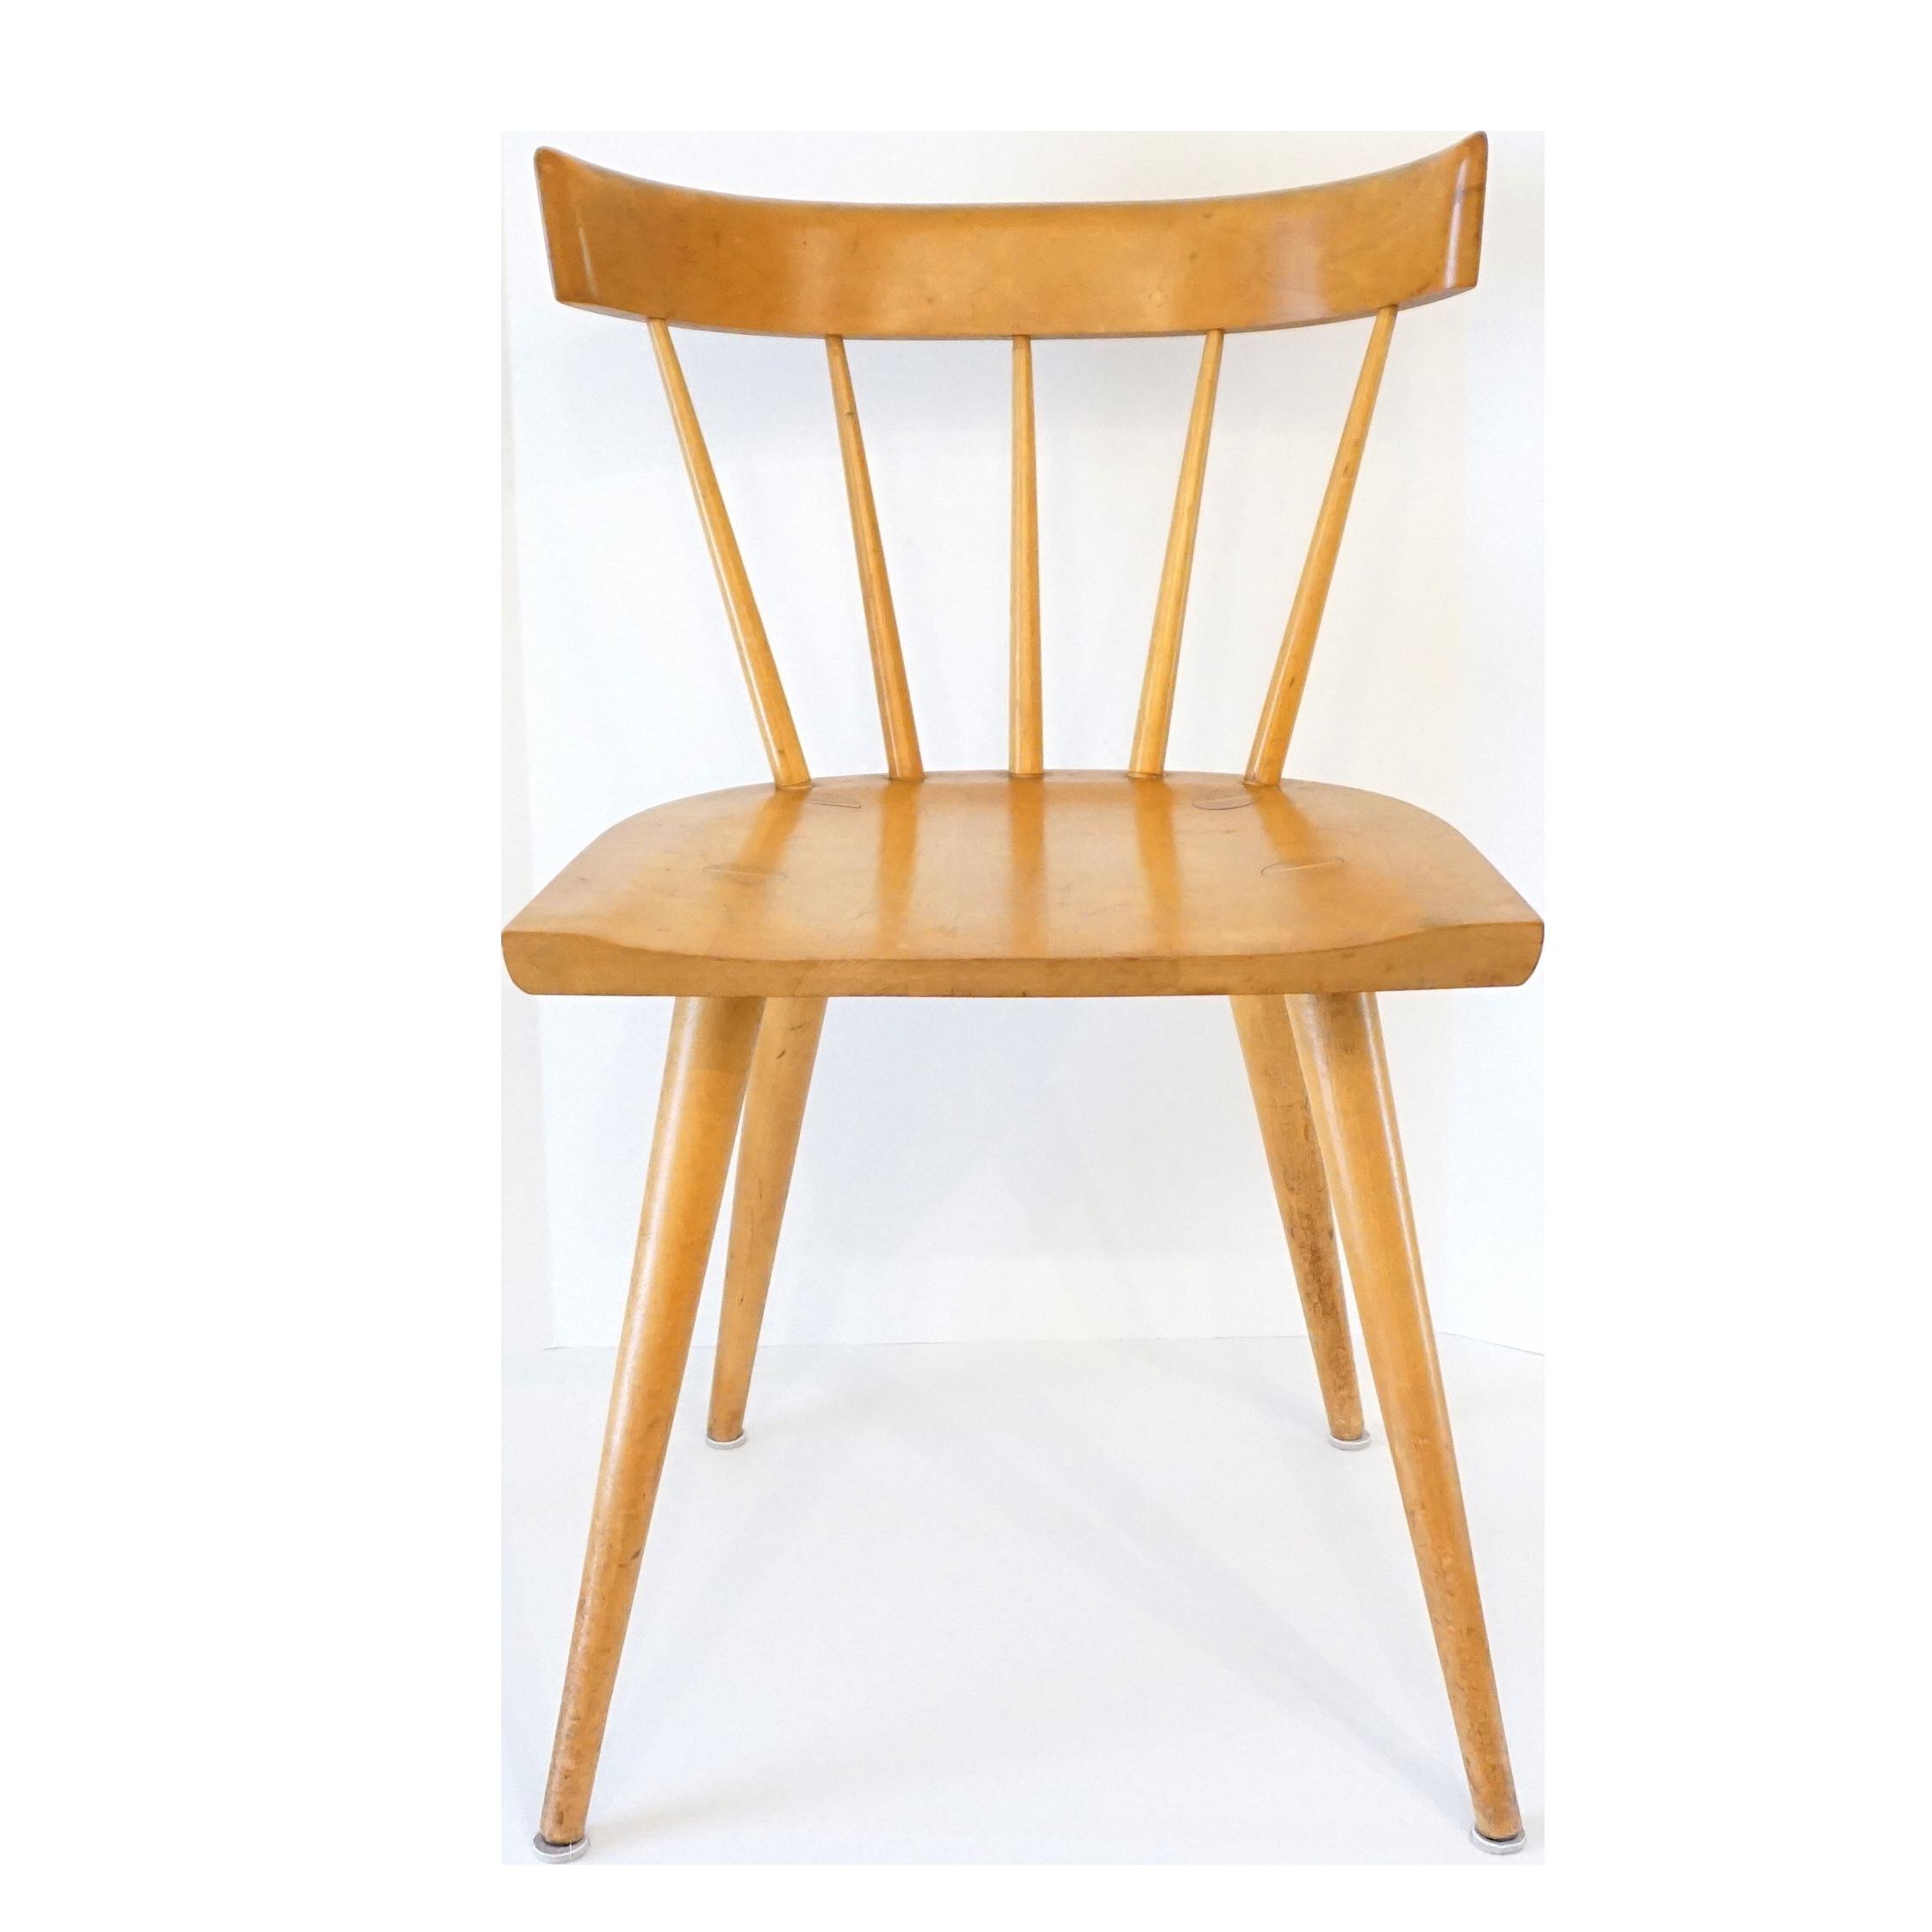 Model 1531 Spindle Back Chair By Paul Mccobb Audra Kiewiet De Jonge Art Interiors